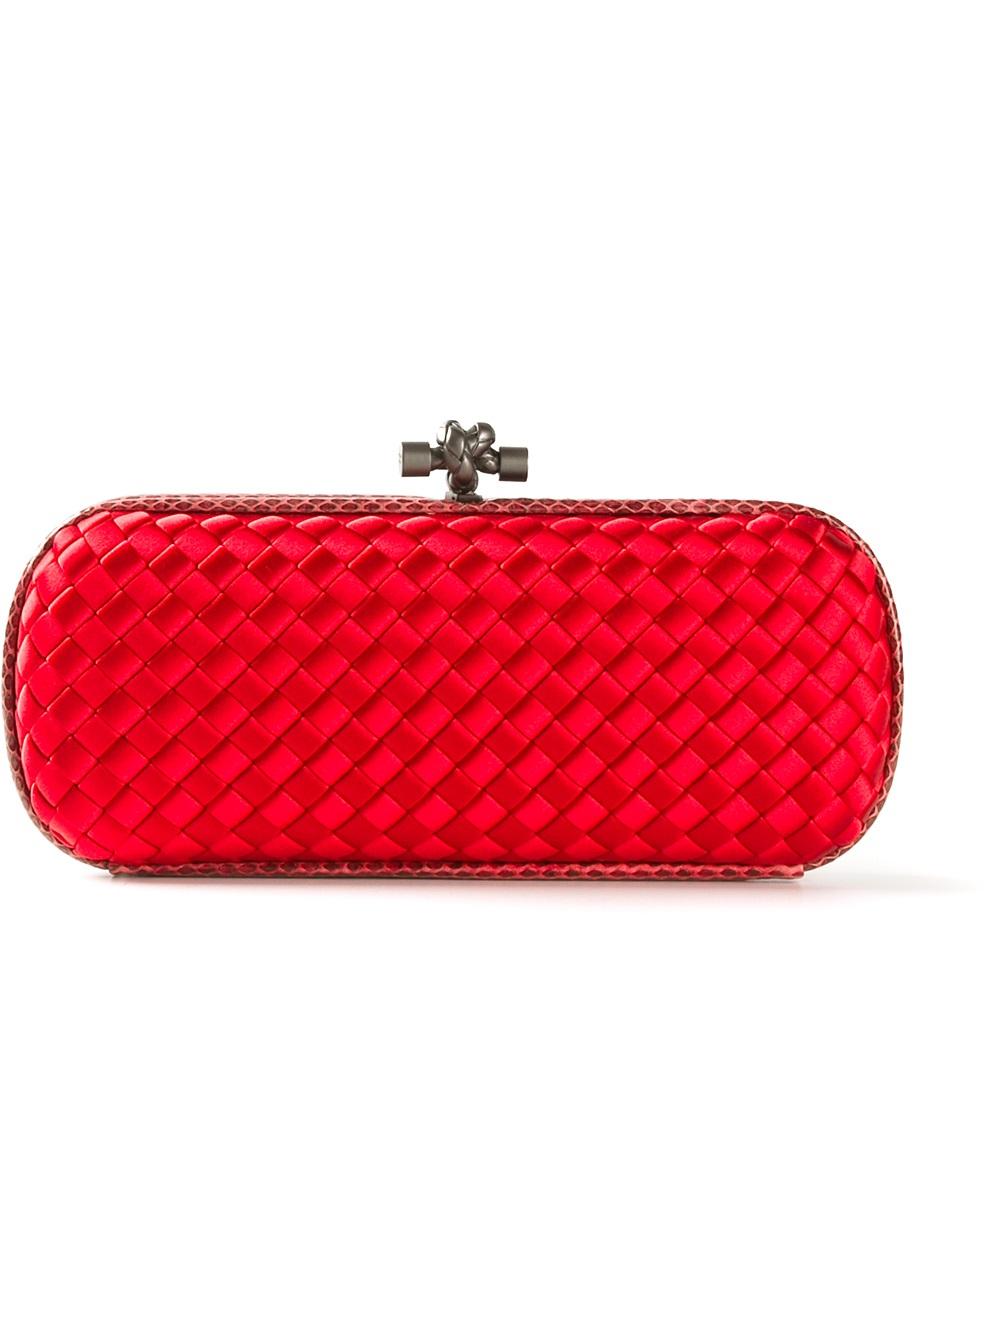 bottega veneta intrecciato clutch in red lyst. Black Bedroom Furniture Sets. Home Design Ideas